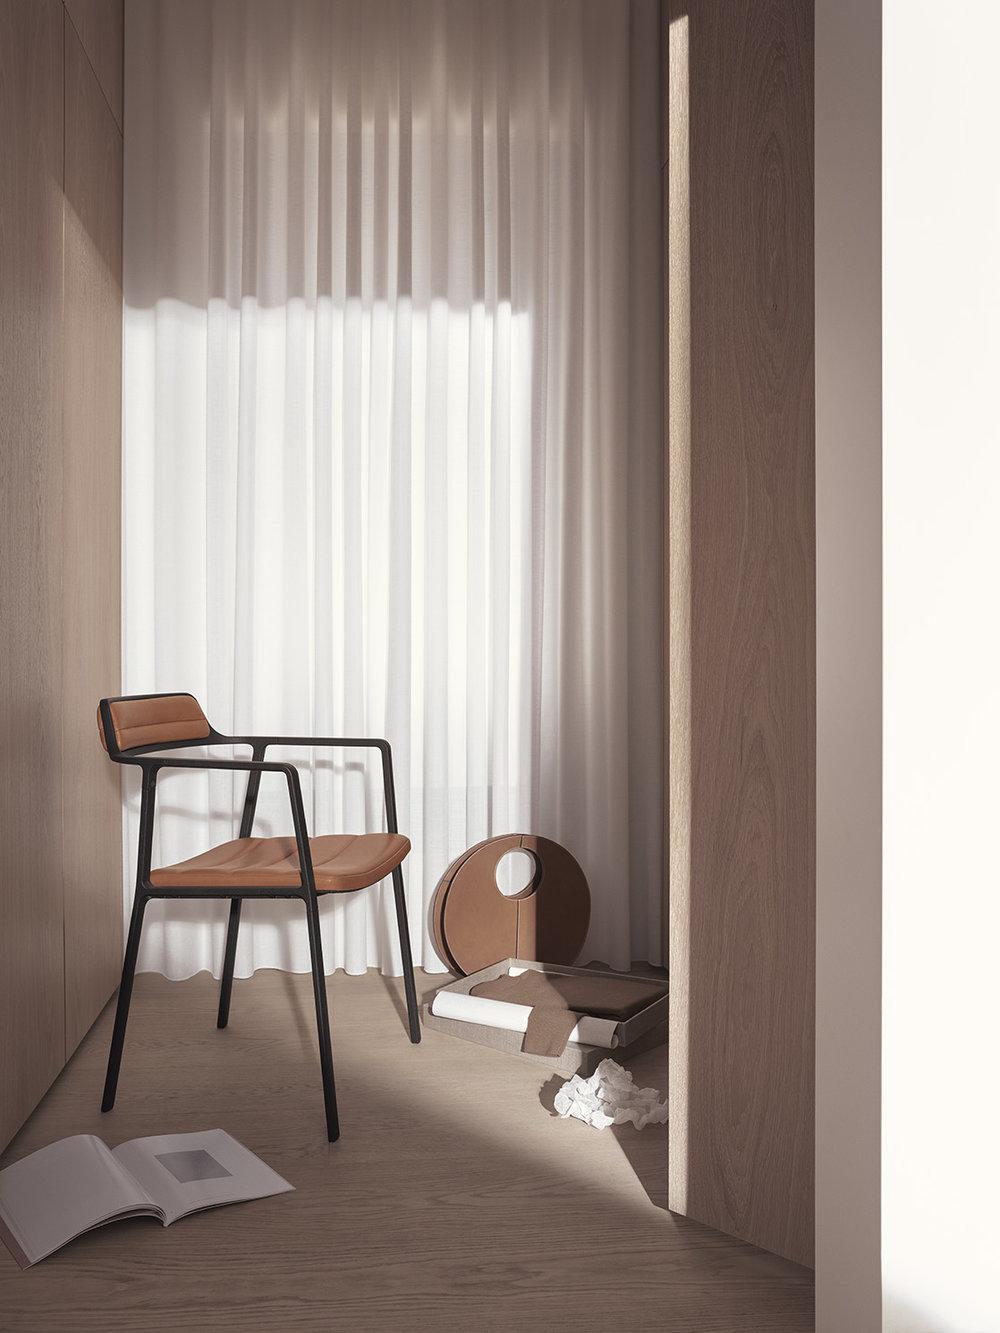 vipp-451-chair-05-low.jpg